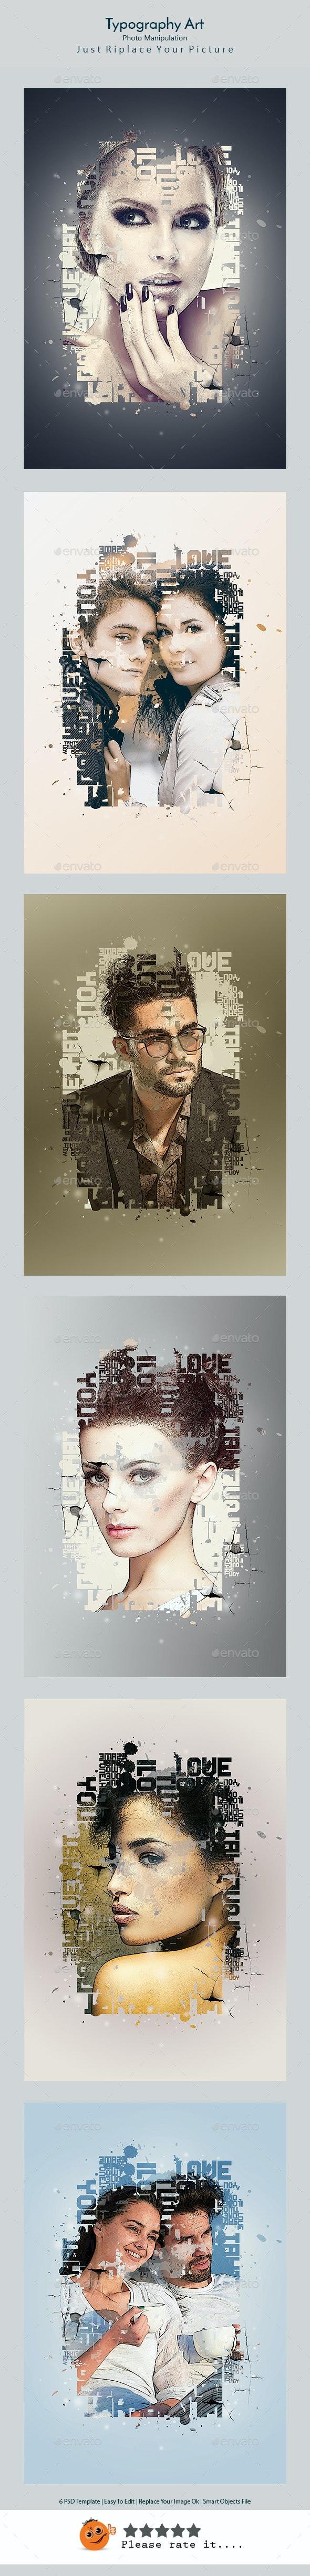 Typography Art - Artistic Photo Templates